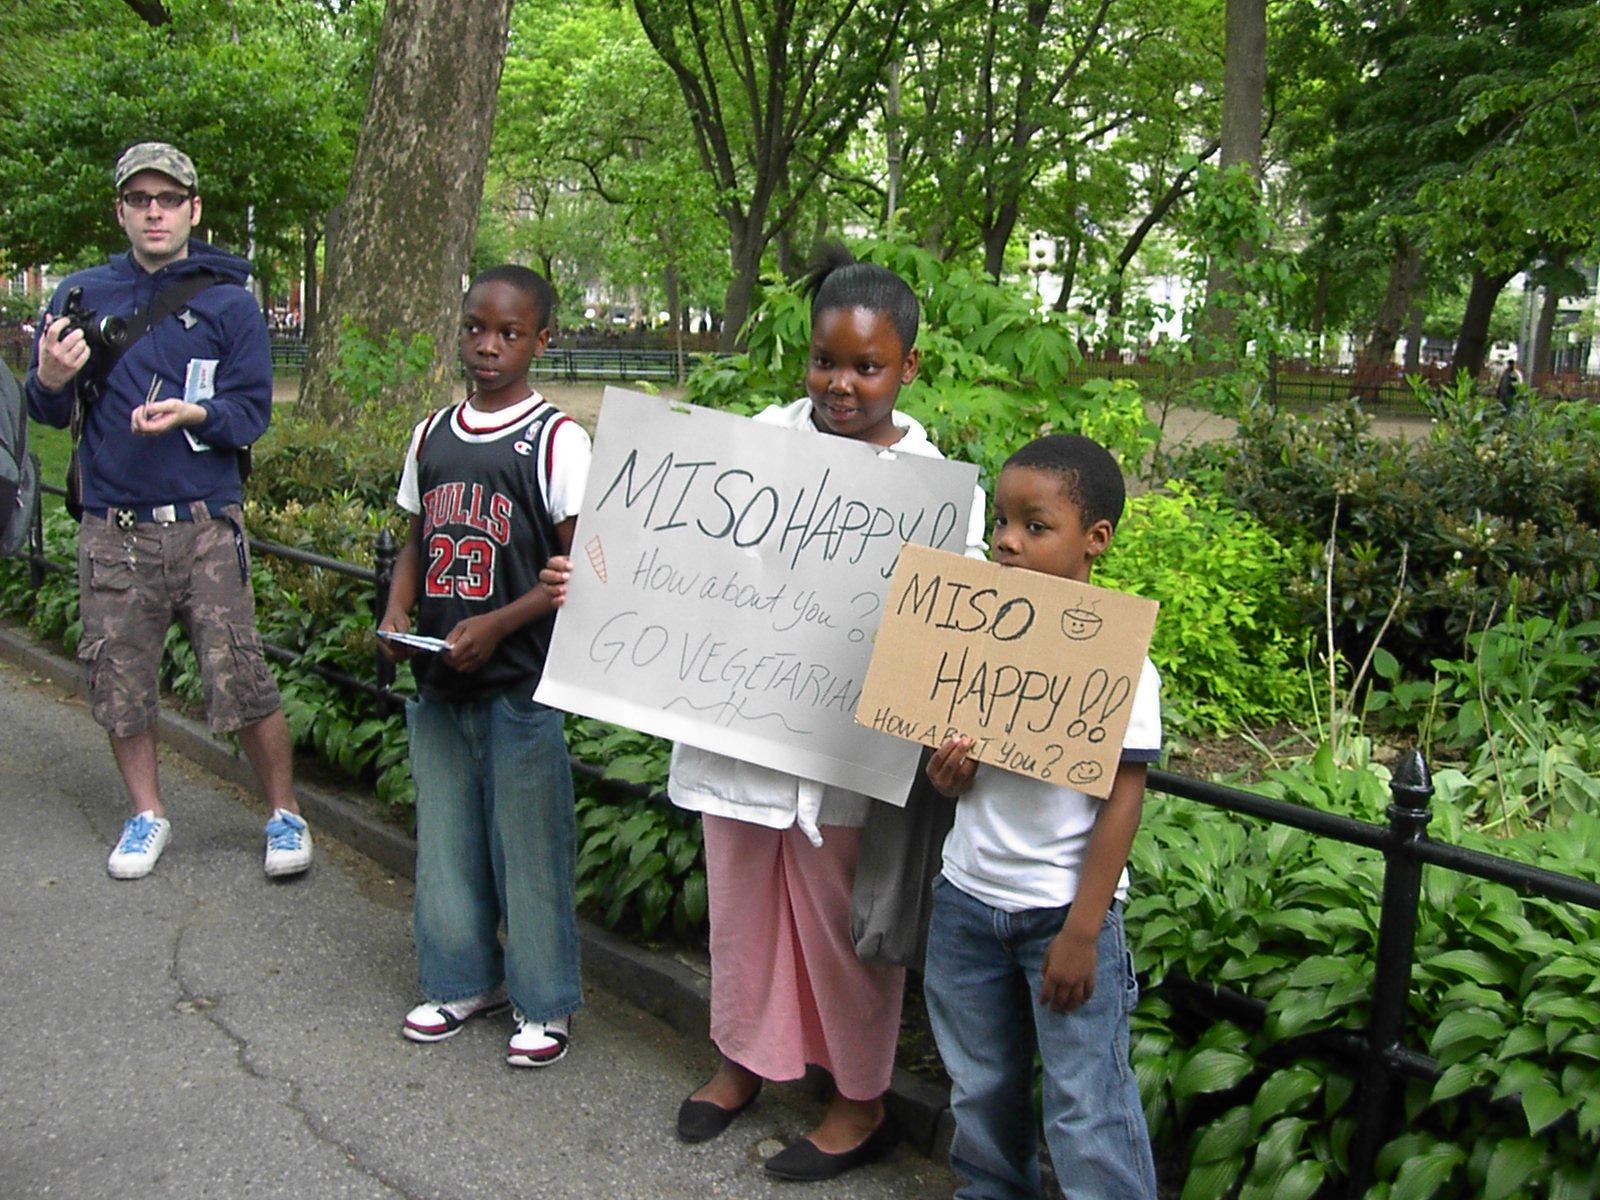 POC veg*n kids at Veggie Pride Parade